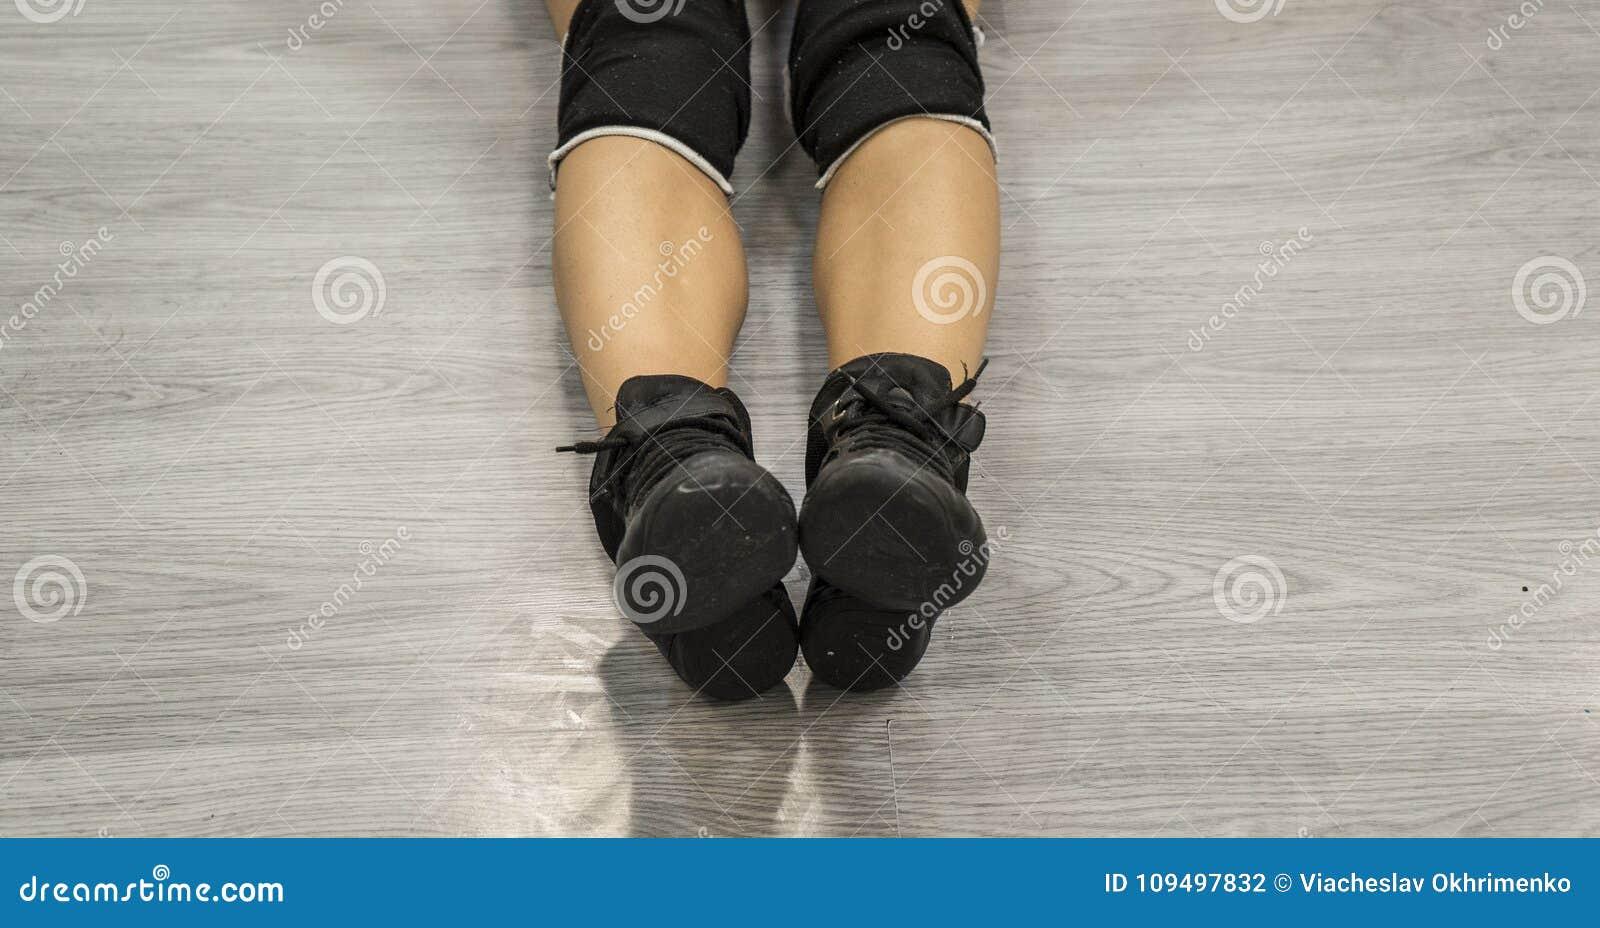 Jazzschuhe Schwarze Schuhe auf Frauen ` s Beinen Tanzschuhe Schwarzes snea